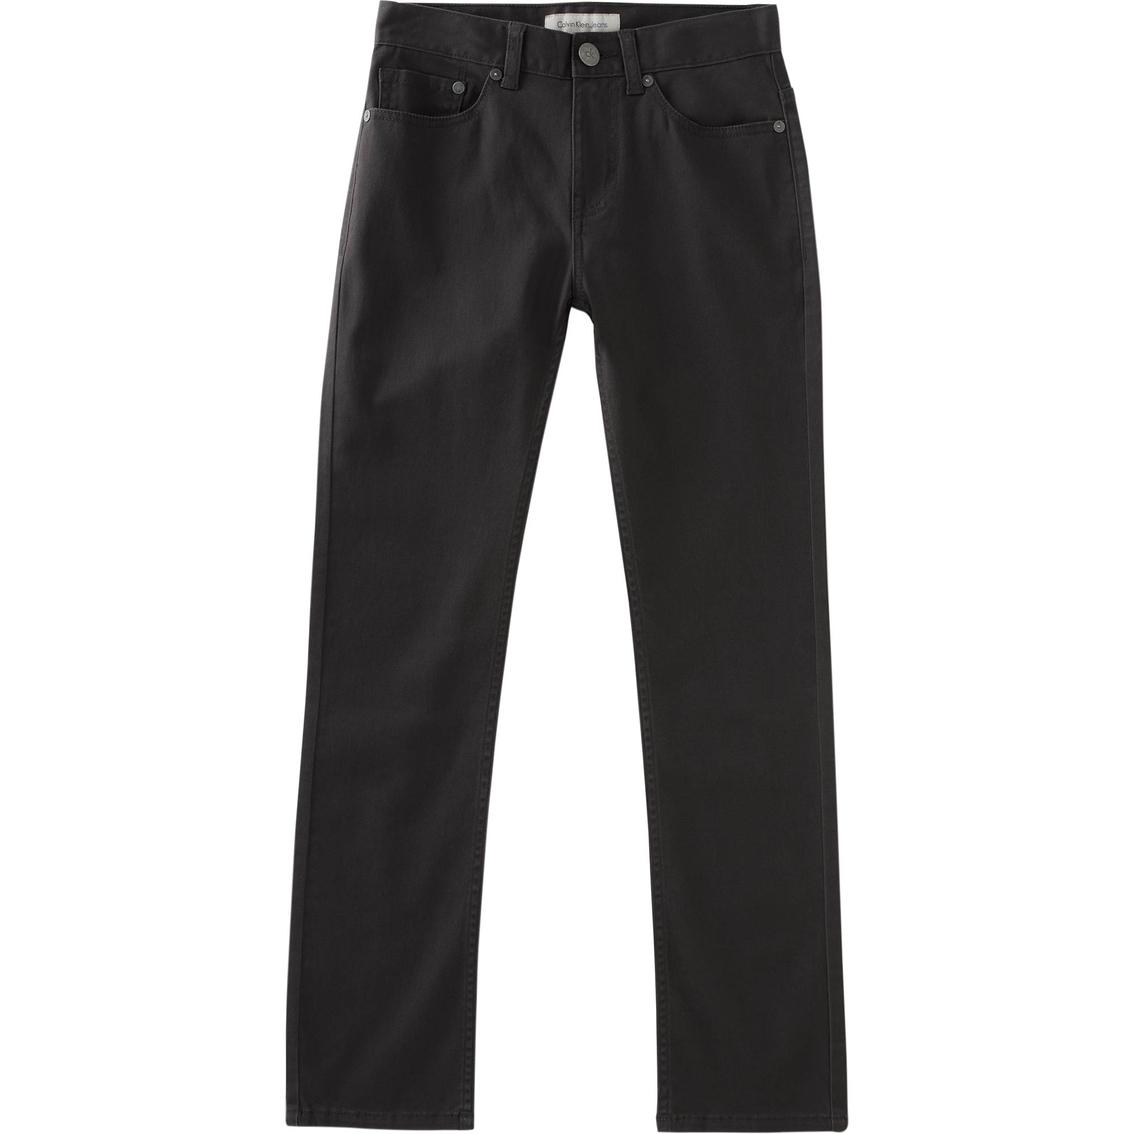 2de3fe0a9436 Calvin Klein Boys 5 Pocket Stretch Pants